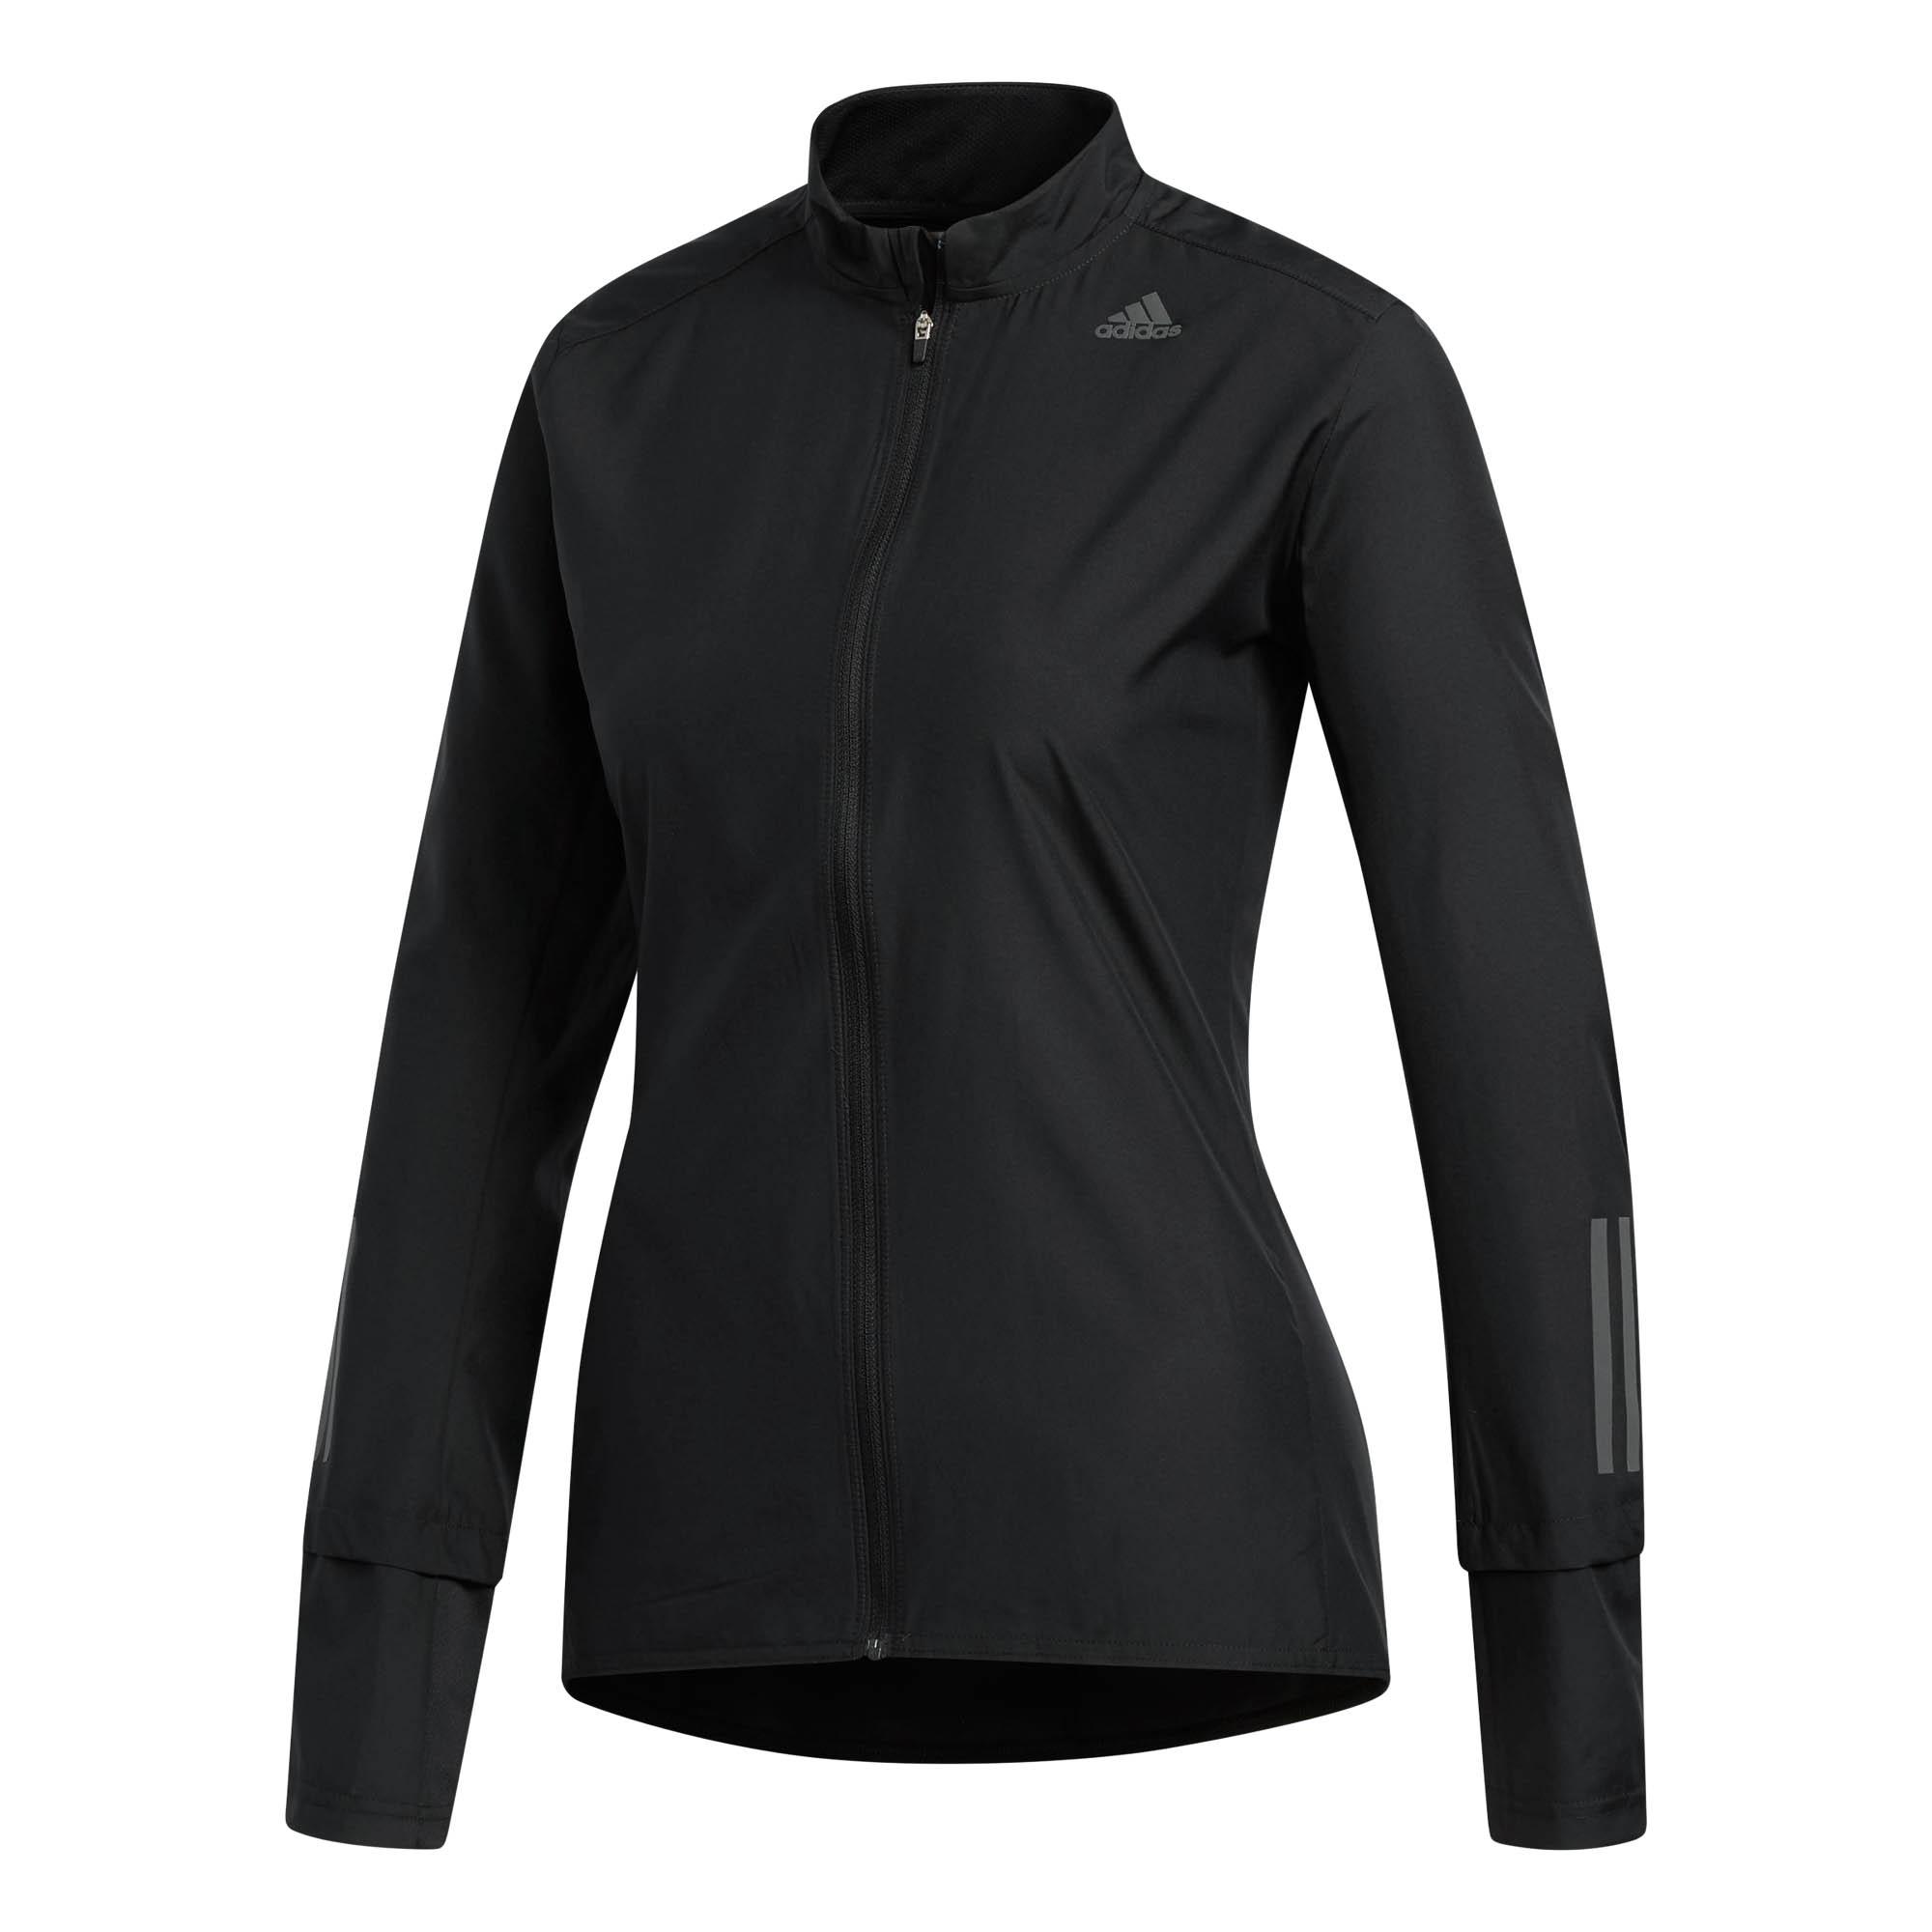 de Chaqueta UK 8 10 Fitness Response Correr Negro Detalles Mujer Adidas MUSzVGjLqp